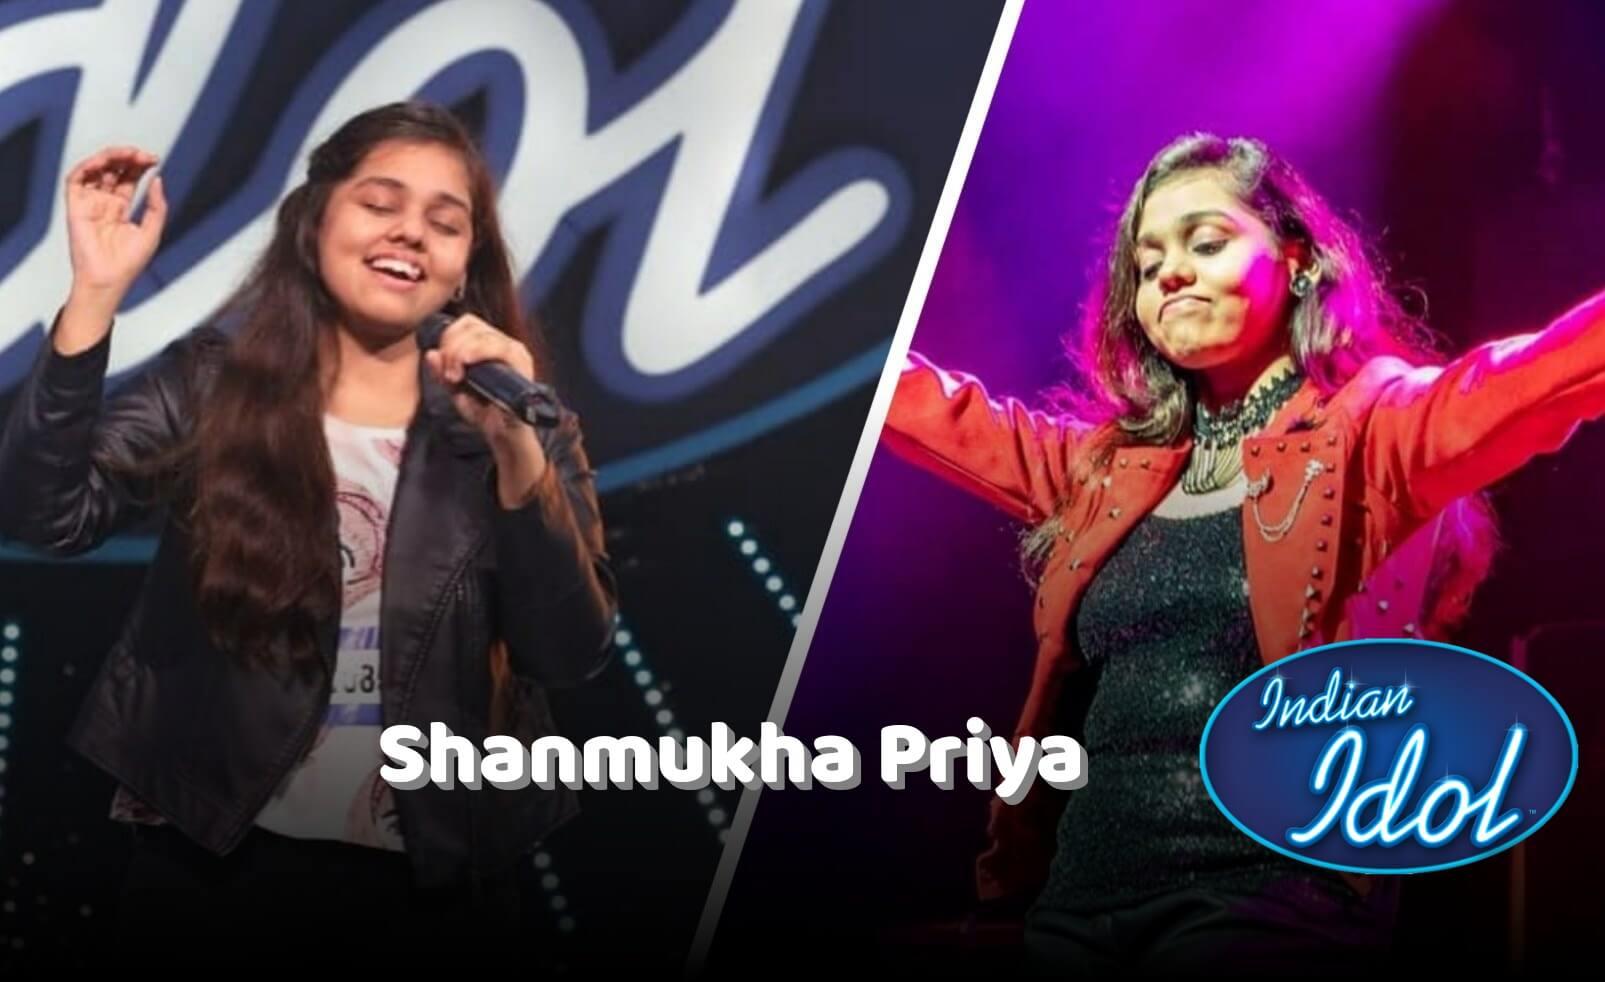 Shanmukha-Priya-Indian-Idol-2020-Contestant-Wiki-Height-Weight-Age-Hometown-Biography-Date-of-Birth